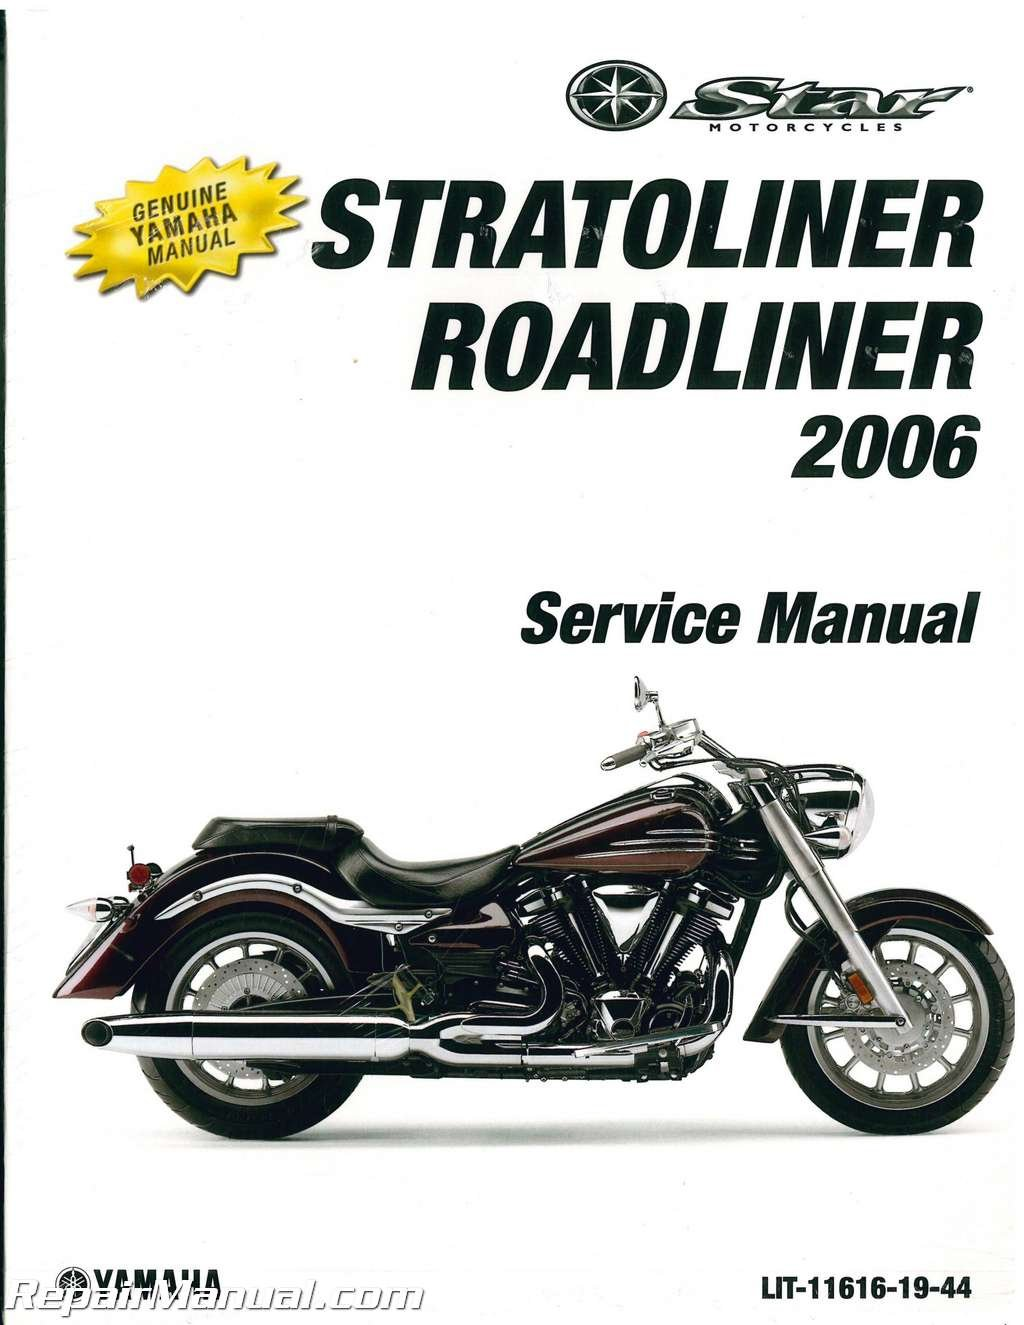 LIT-11616-19-44 2006 Yamaha XV19 Stratoliner S Midnight Motorcycle Service  Manual: Manufacturer: Amazon.com: Books